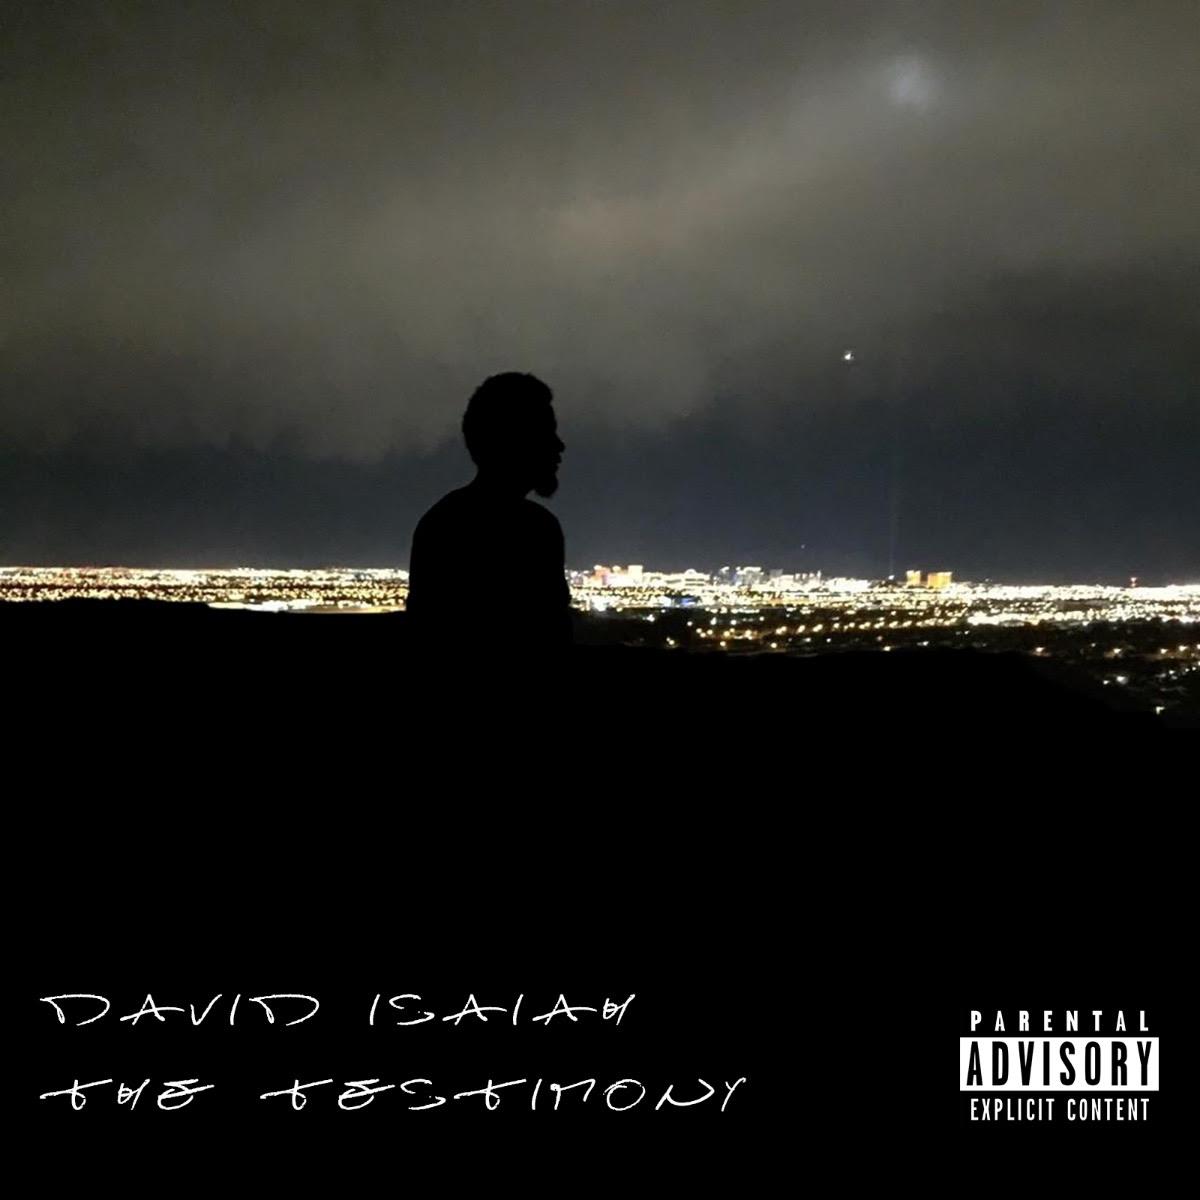 David Isaiah - The Testimony.jpg